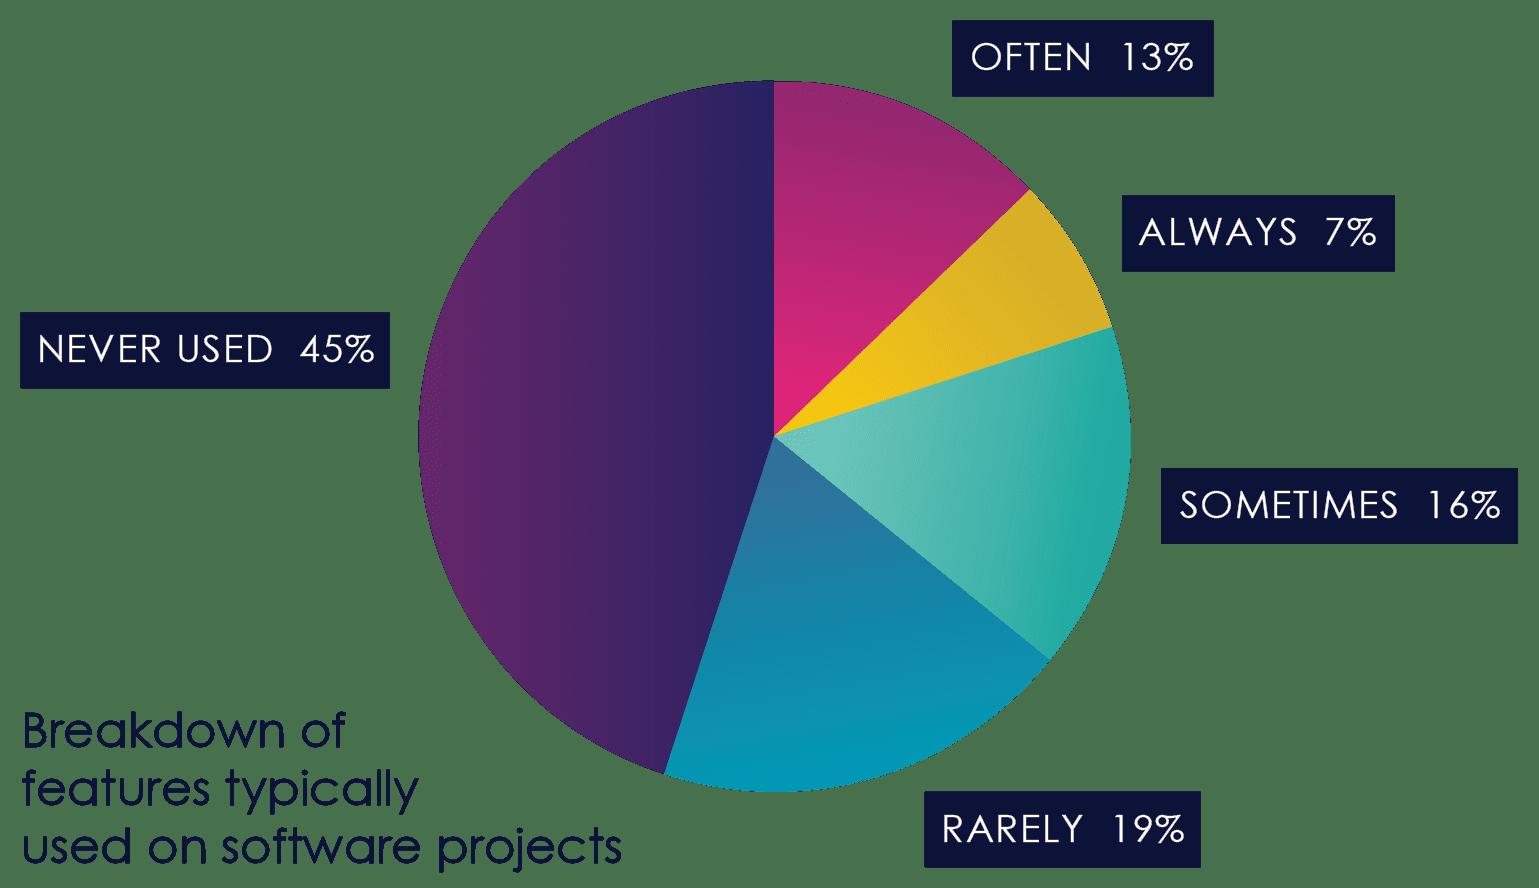 /Users/lichen/Desktop/eBook_graphs_3.pie chart copy.png